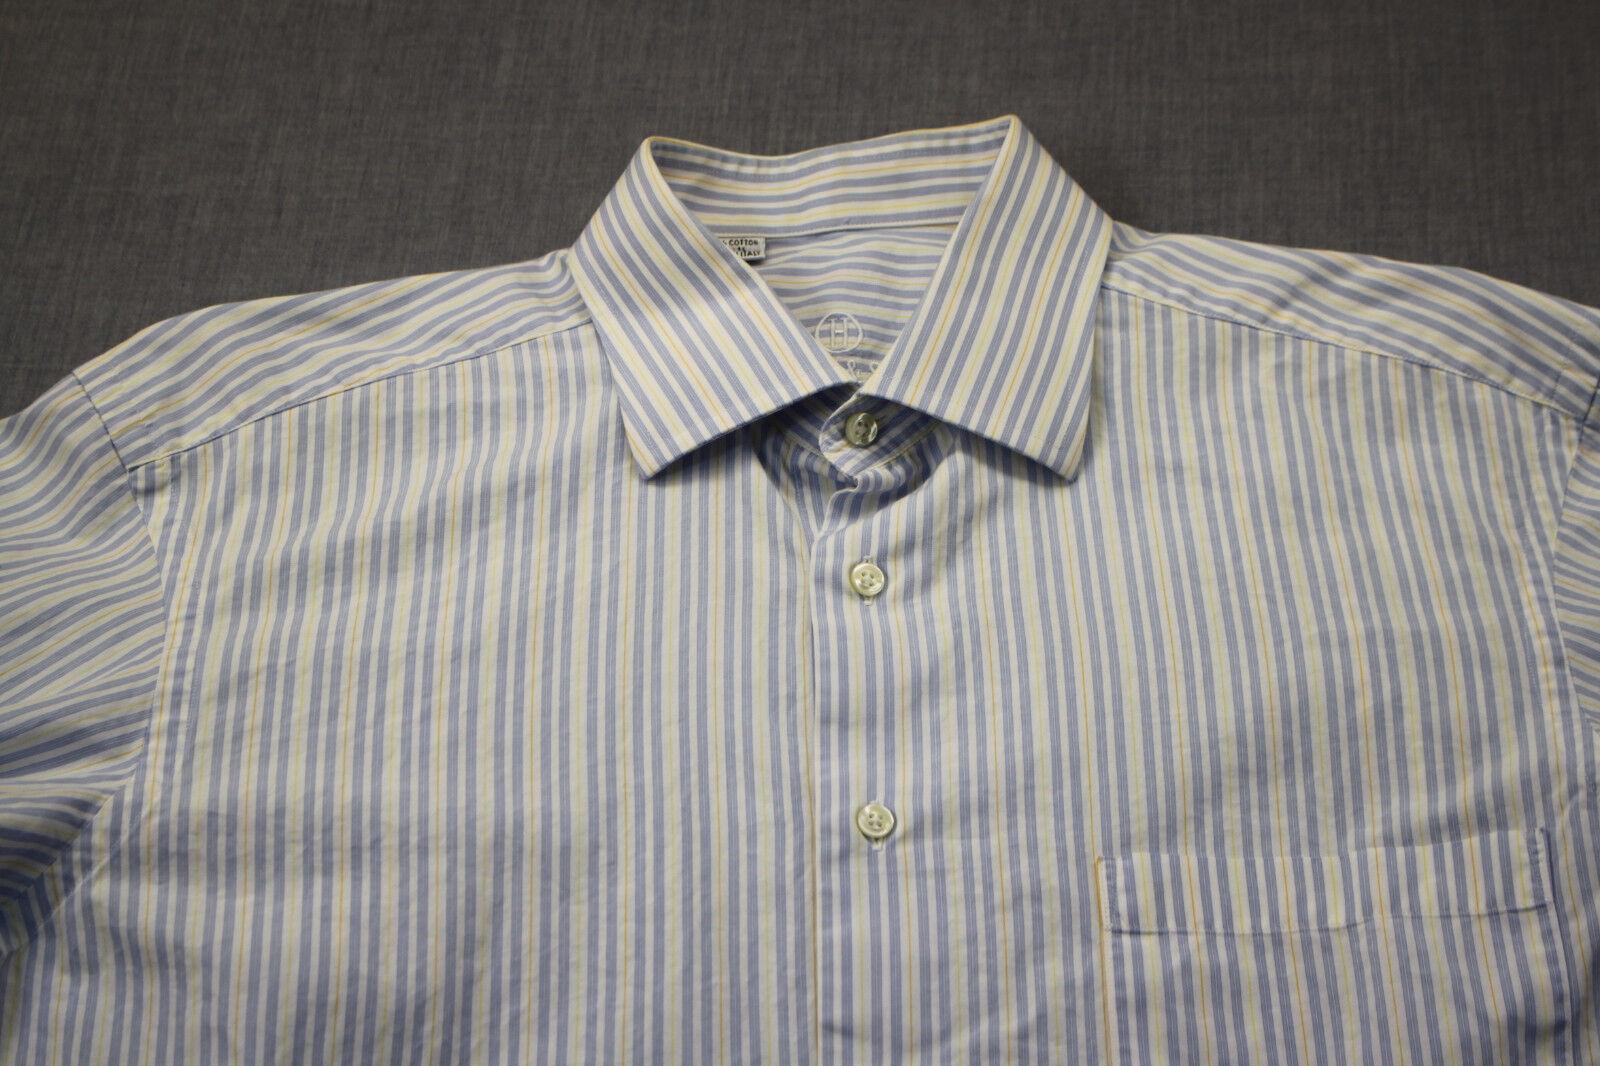 Harry & Sons Made  männer Blau Weiß Gelb Stripe Dress hemd NEW 41 16 32 33